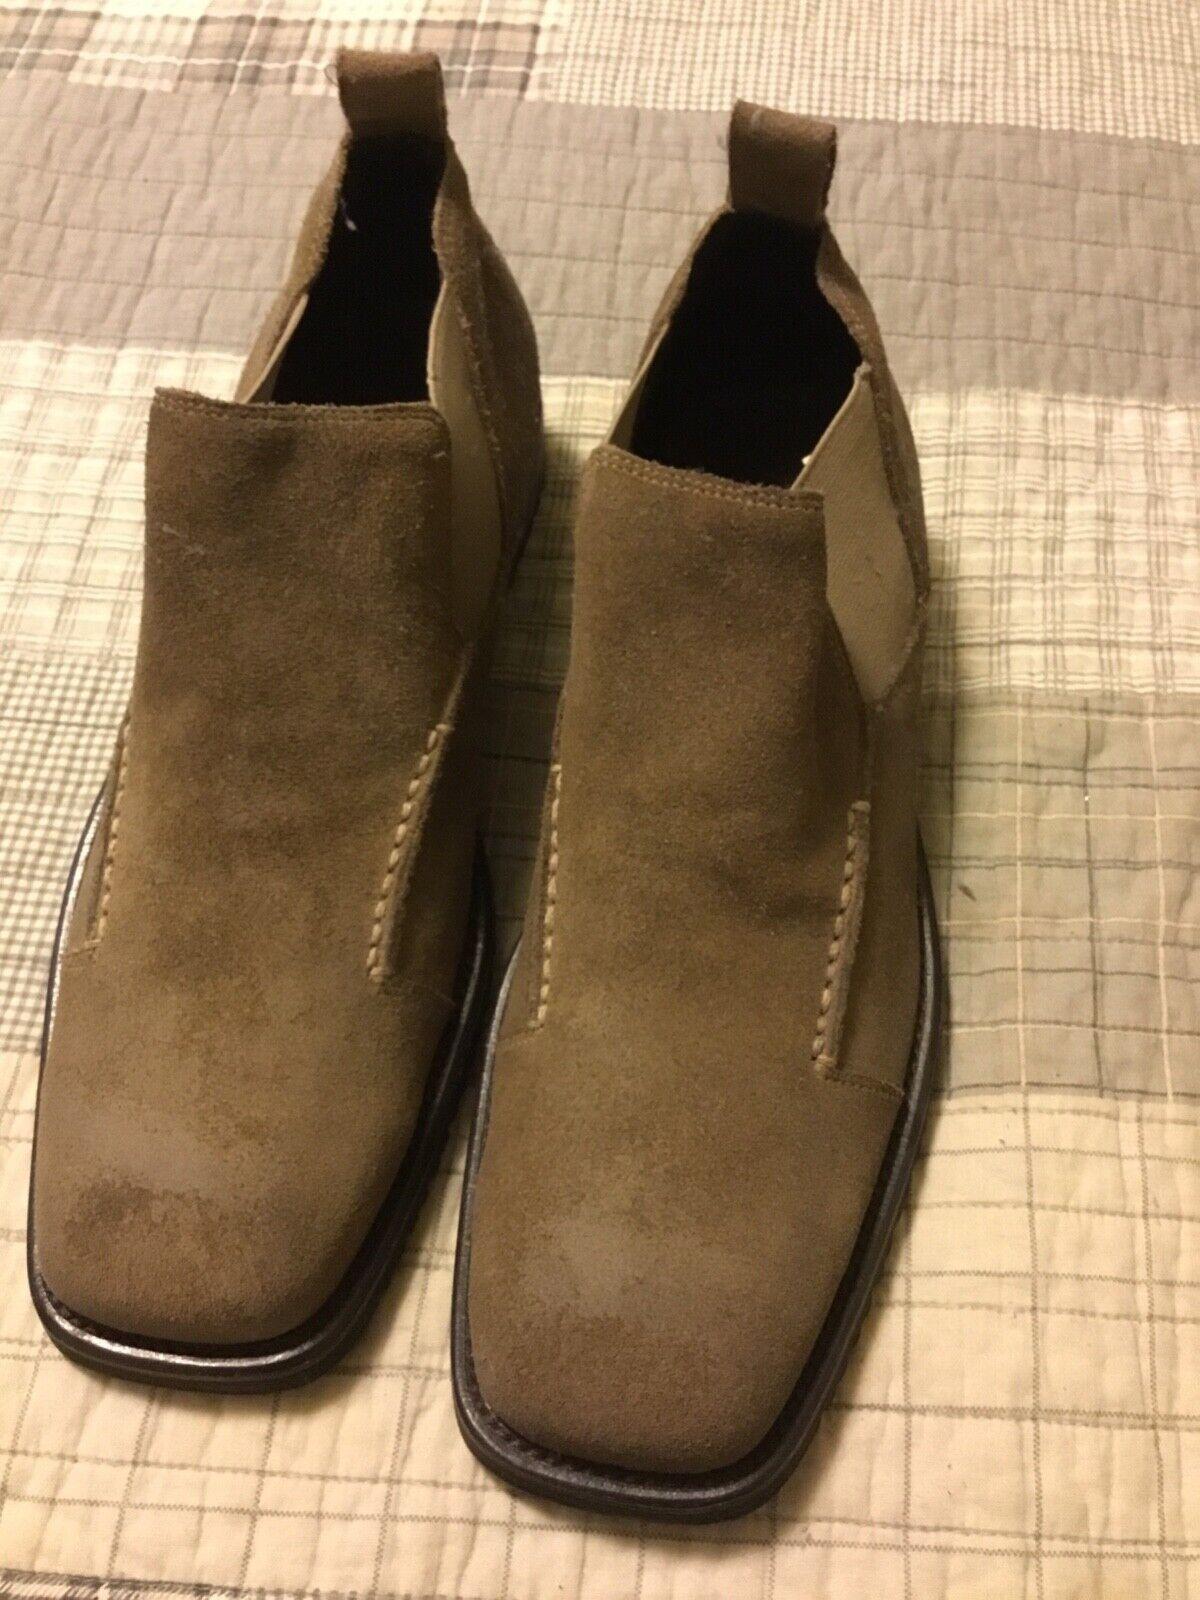 Aston Grey Men's ankle boot suede light olive color size 9.5